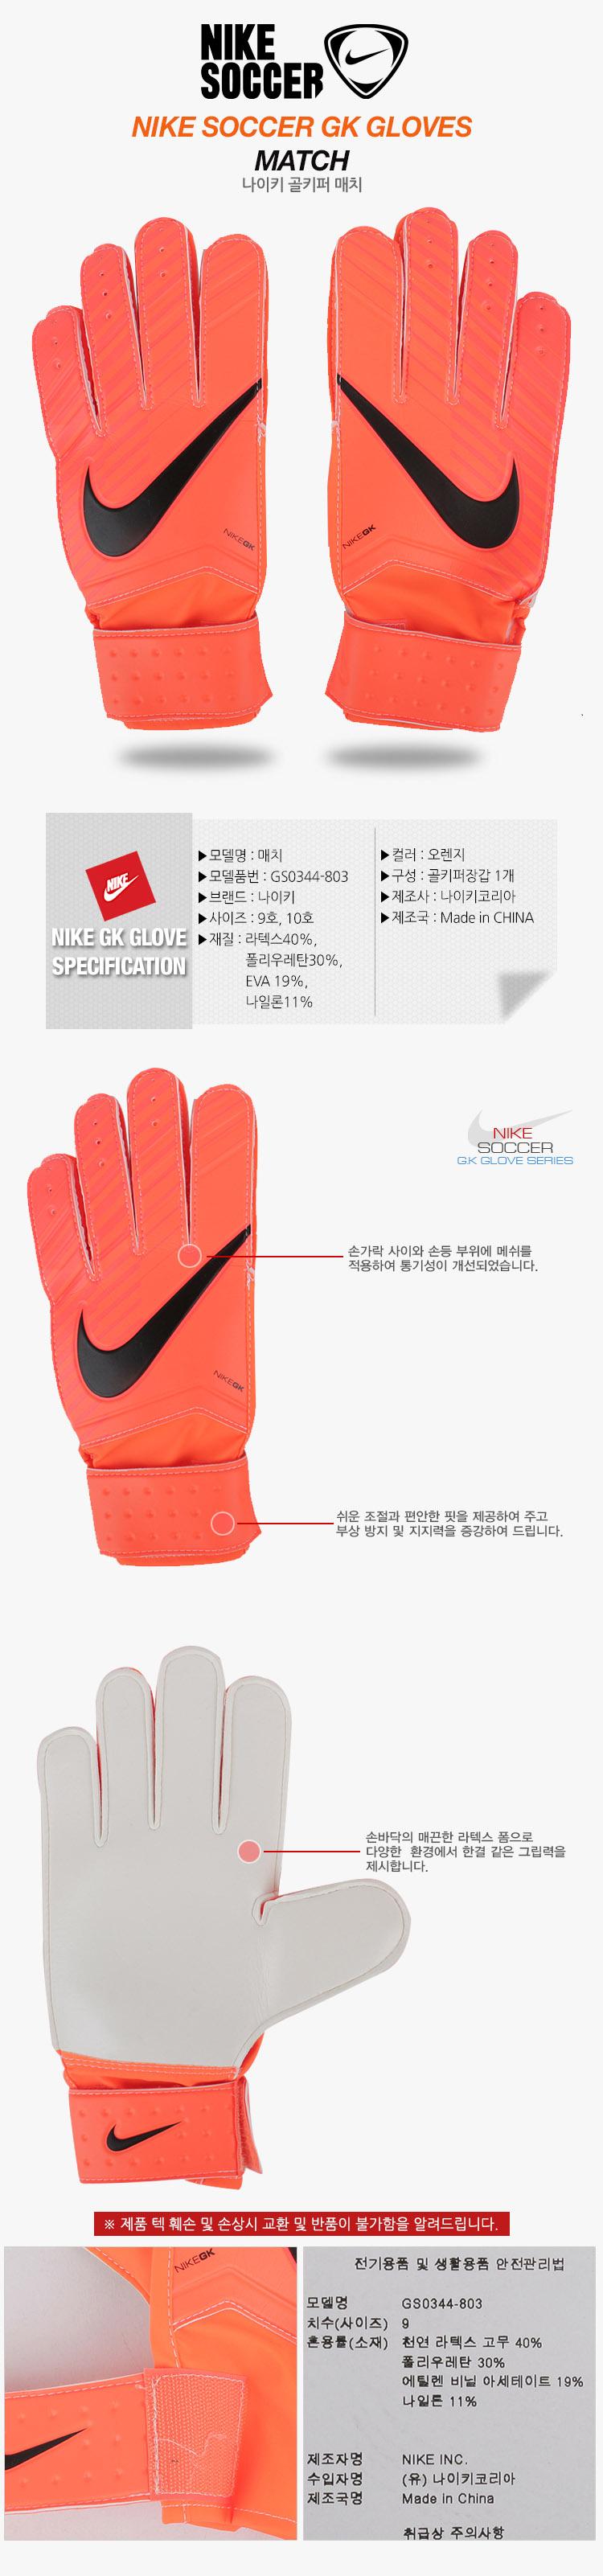 4d1e07e6a GS0281 Soccer N I K E I N C Nike Gk Classic Goalie Glove